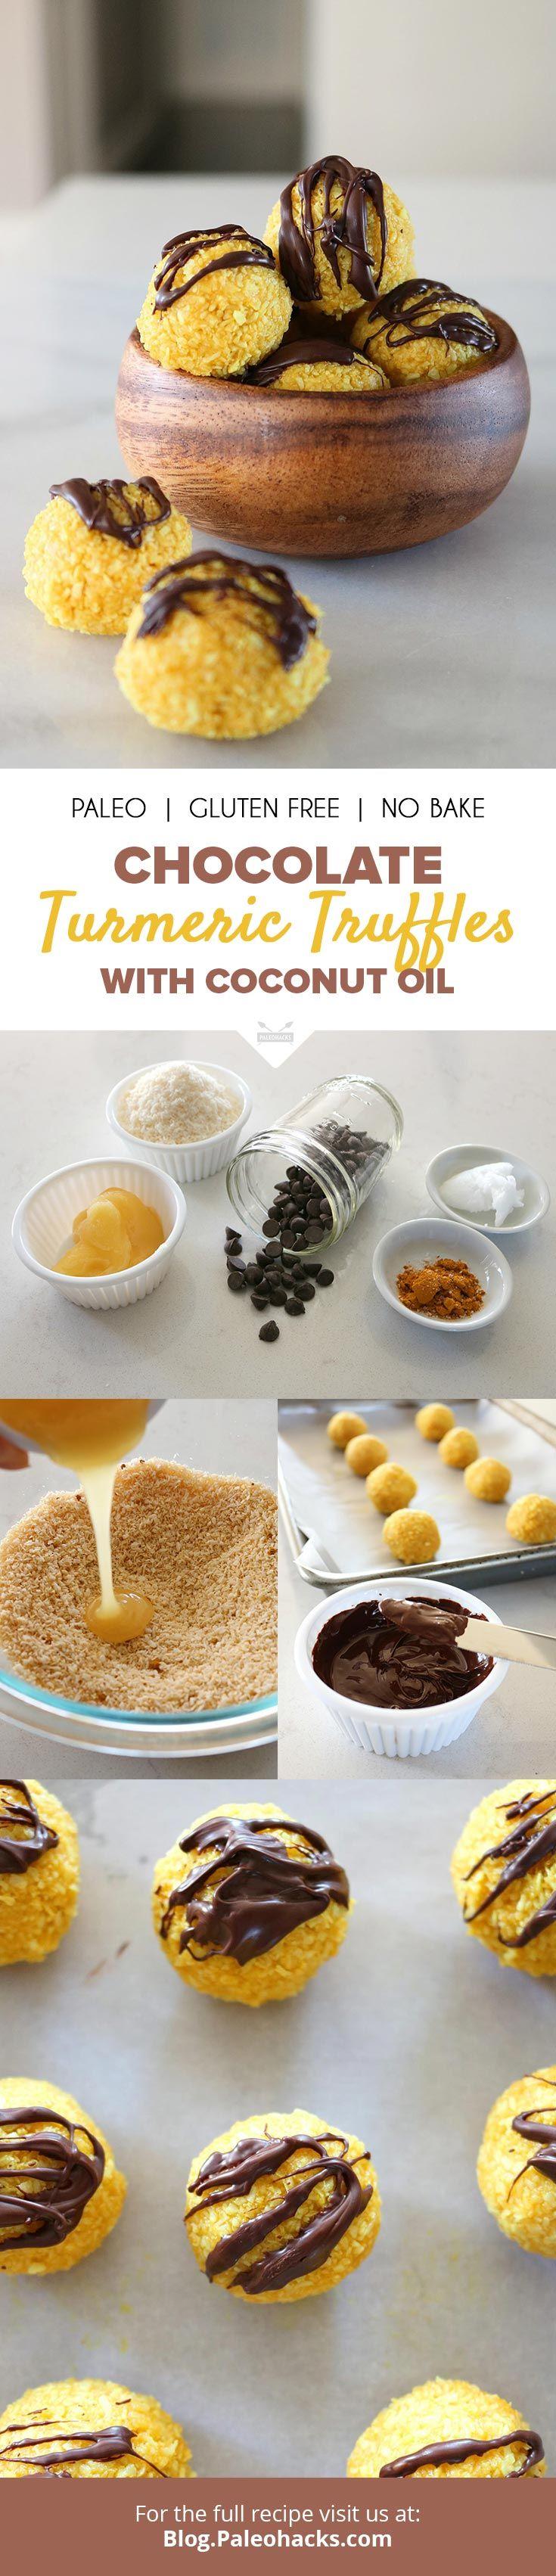 Chocolate Turmeric Truffles with Coconut Oil   #justeatrealfood #paleohacks